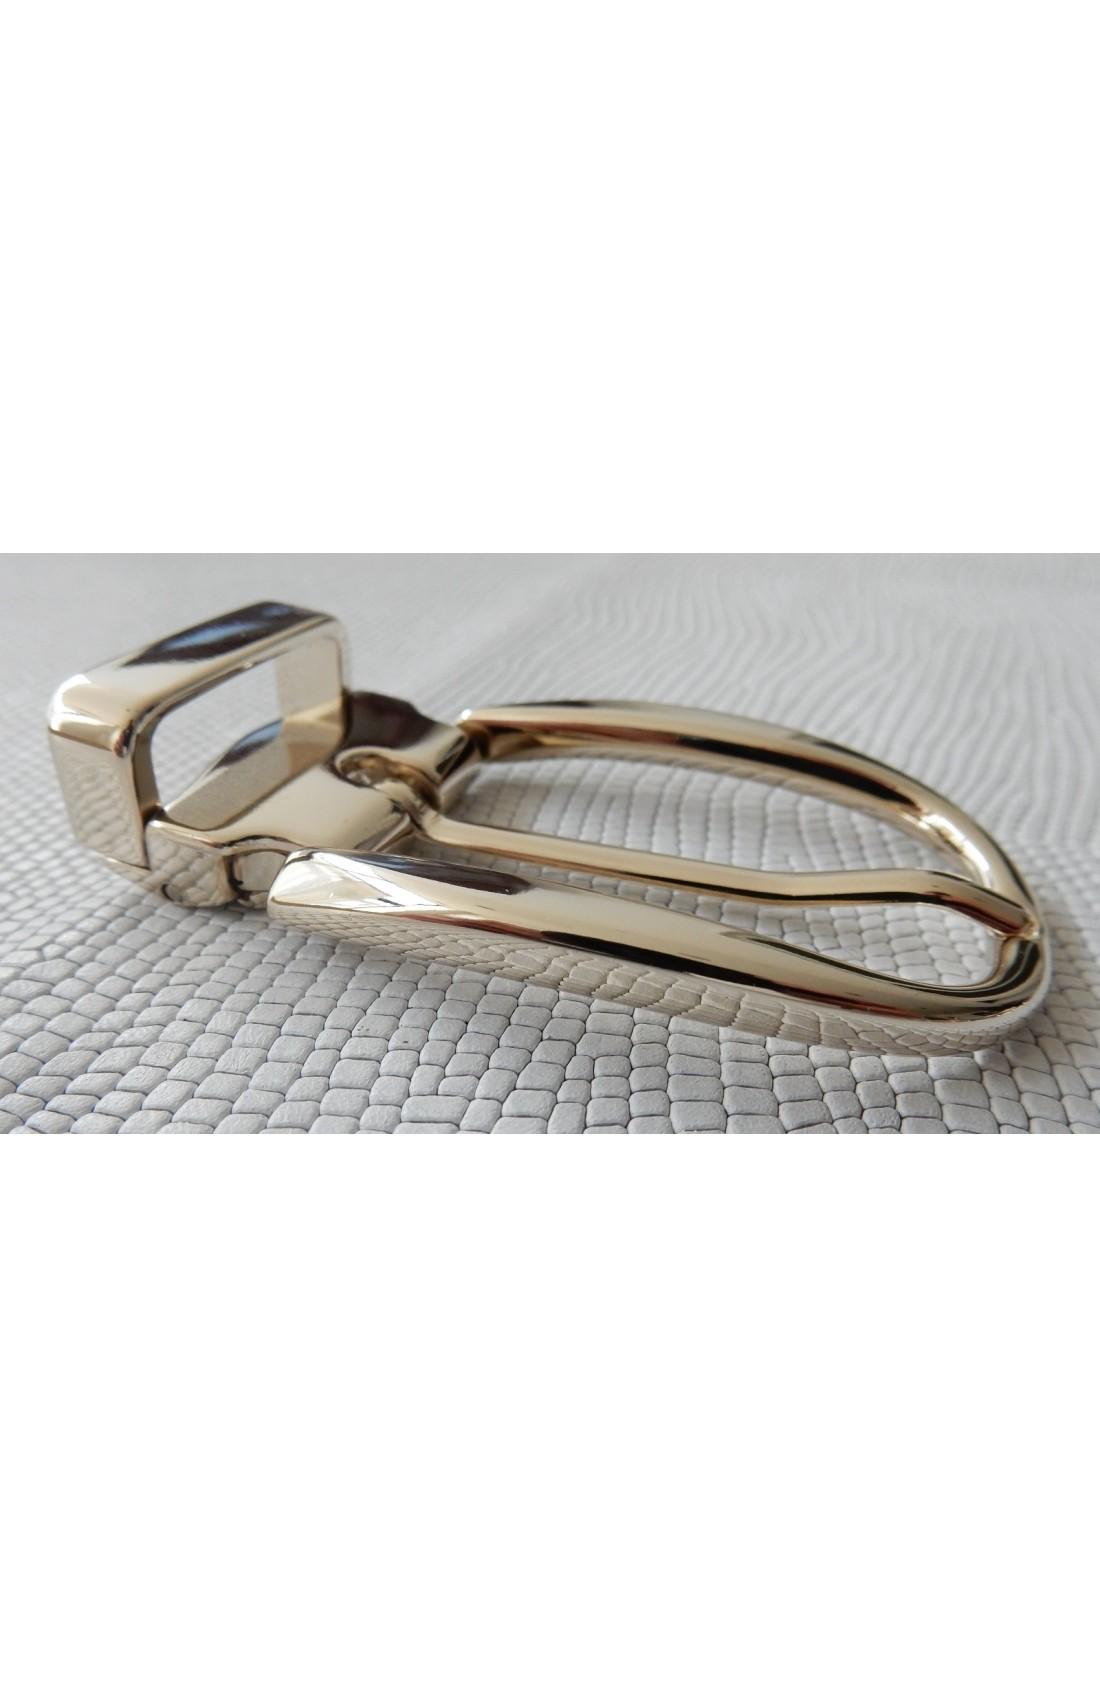 Fibbia Standard L 140 mm.25 oro chiaro (2)